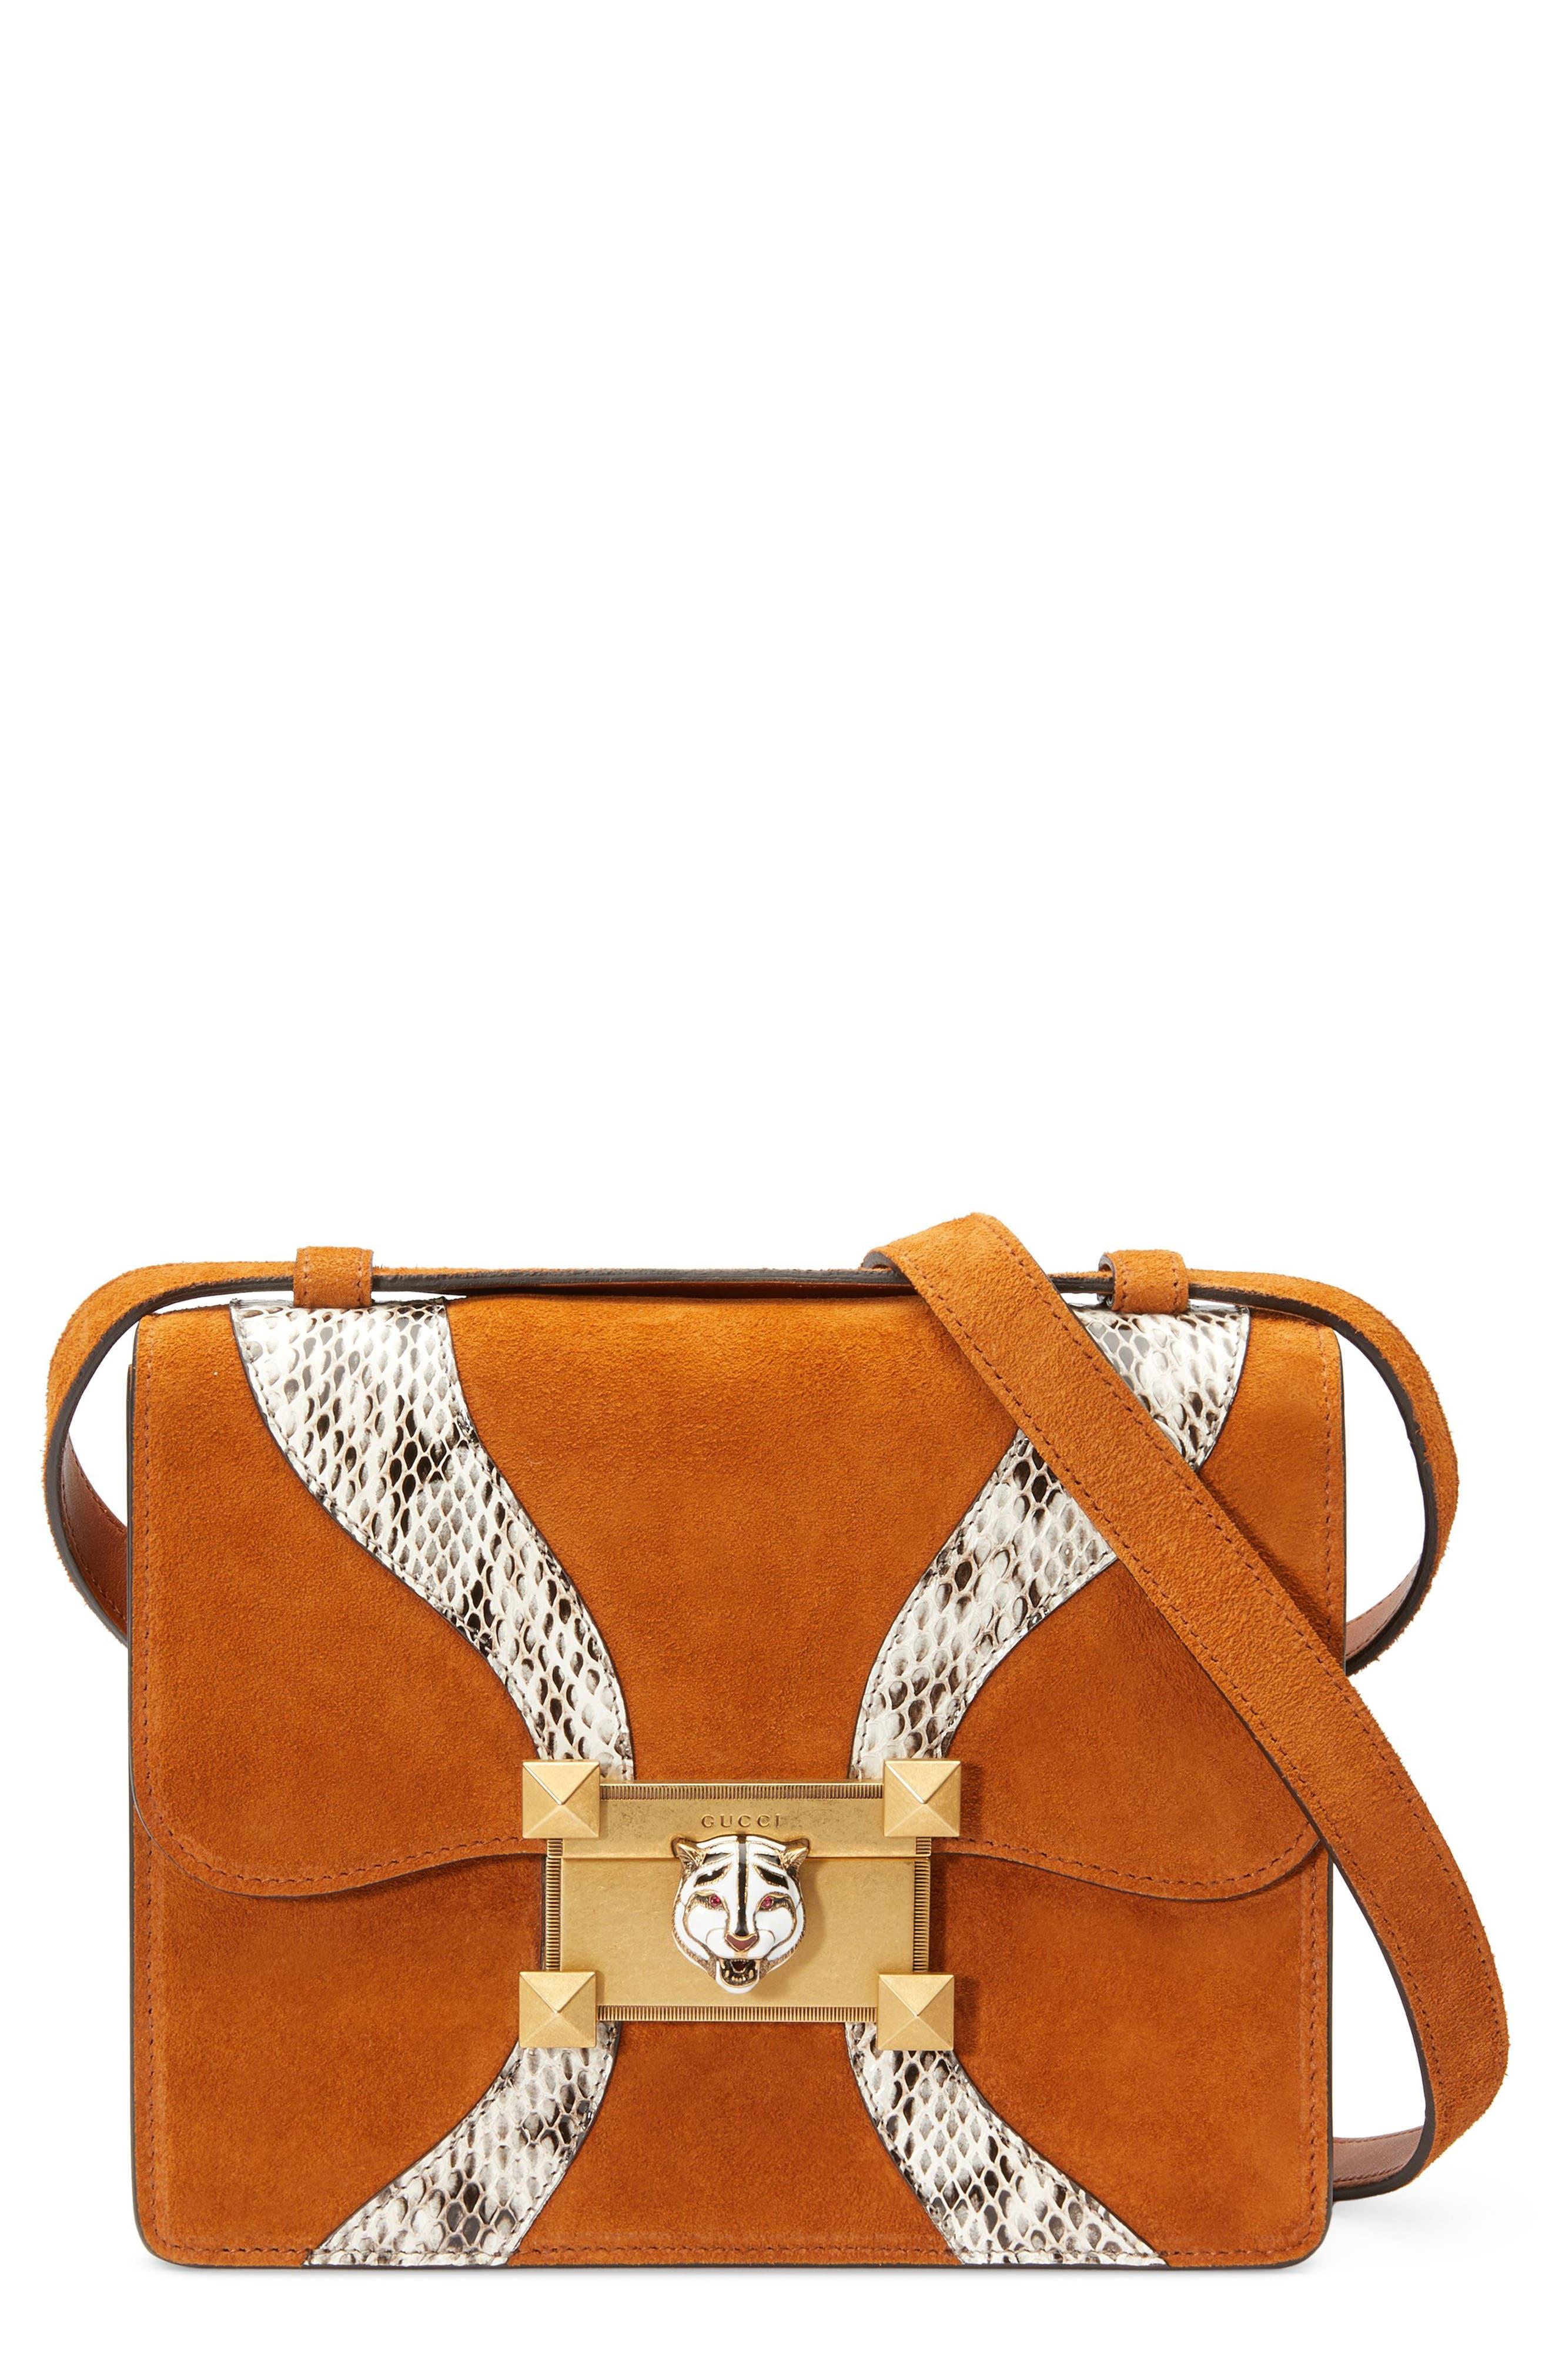 Osiride Suede & Genuine Snakeskin Shoulder Bag,                         Main,                         color, Bright Cuir/ Roccia